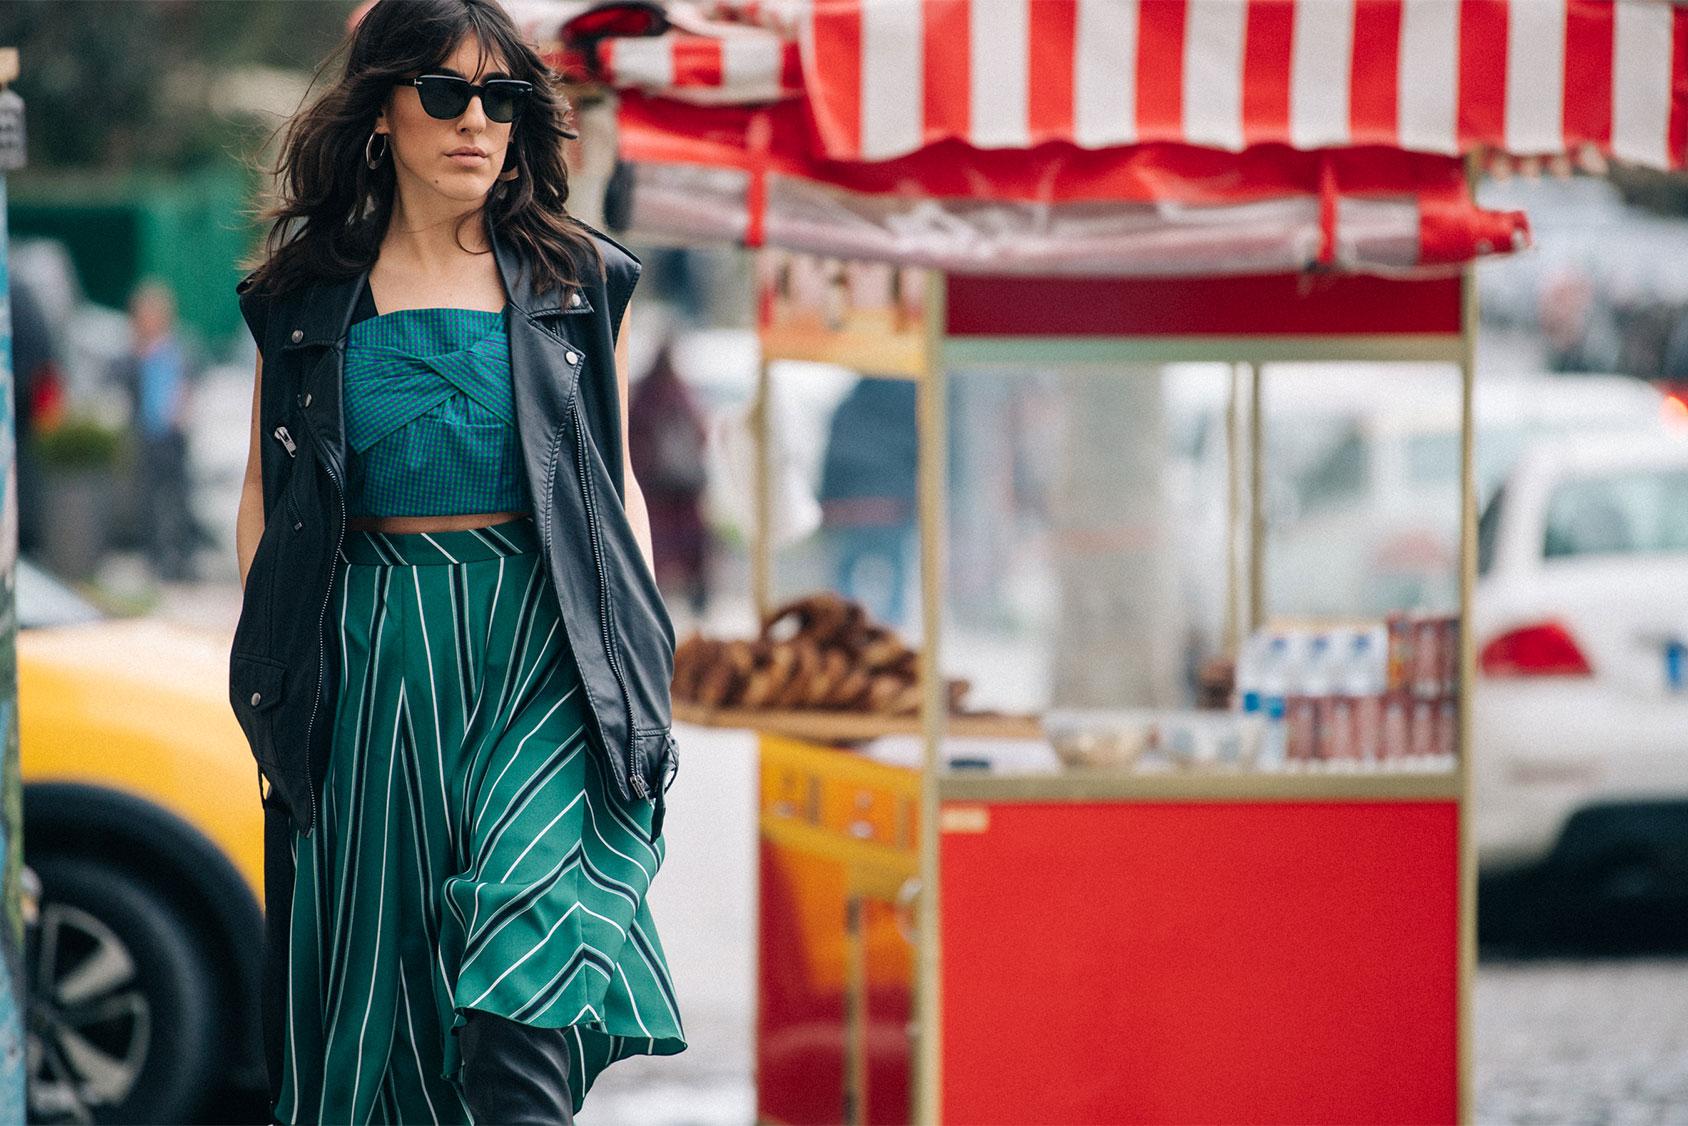 Nil Ninat in H&M skirt